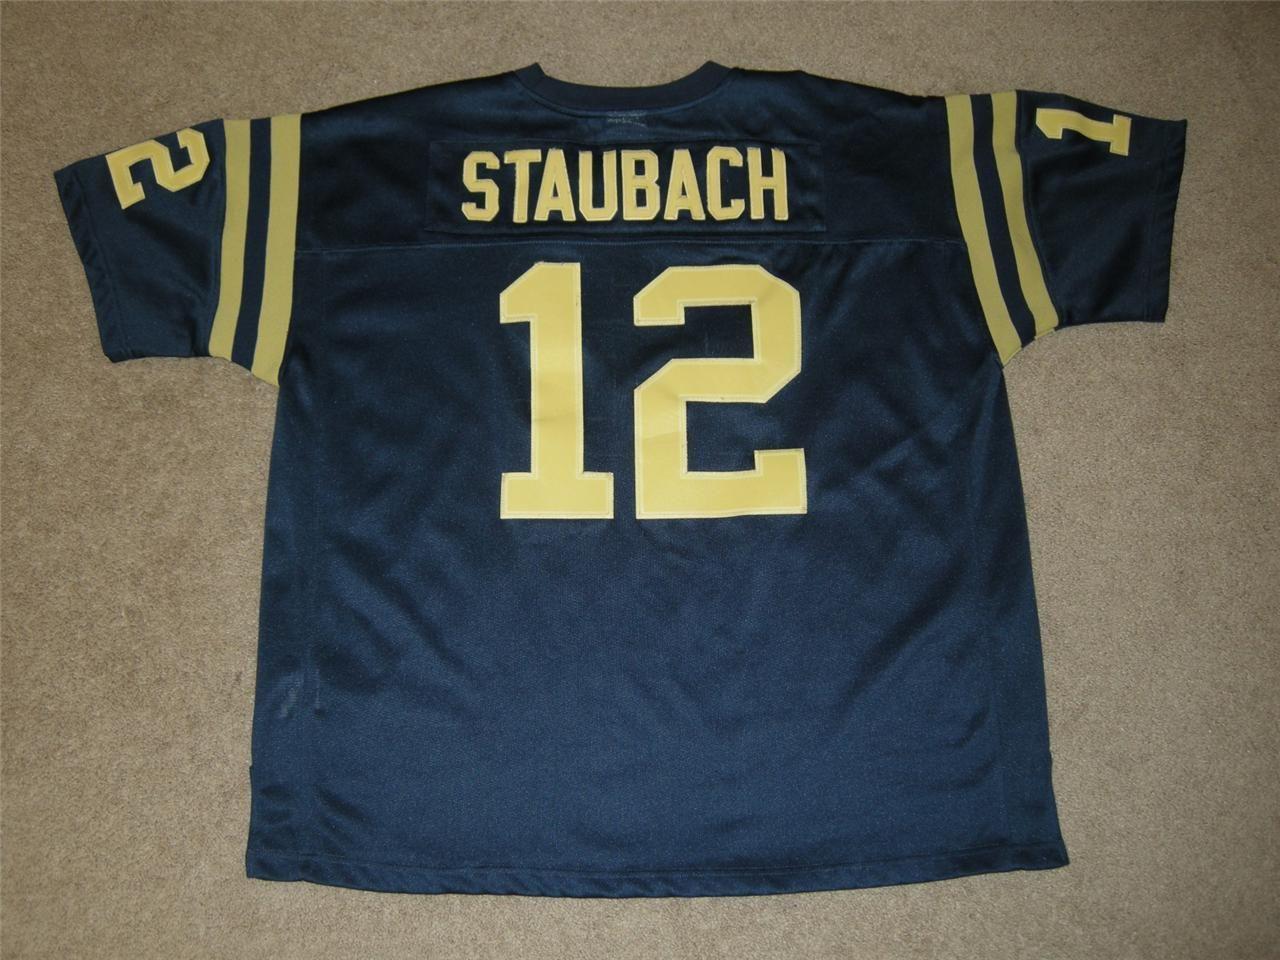 d328edb91db #12 ROGER STAUBACH U.S. Naval Academy NCAA Quarterback 1962-1964 and the  1963 Heisman